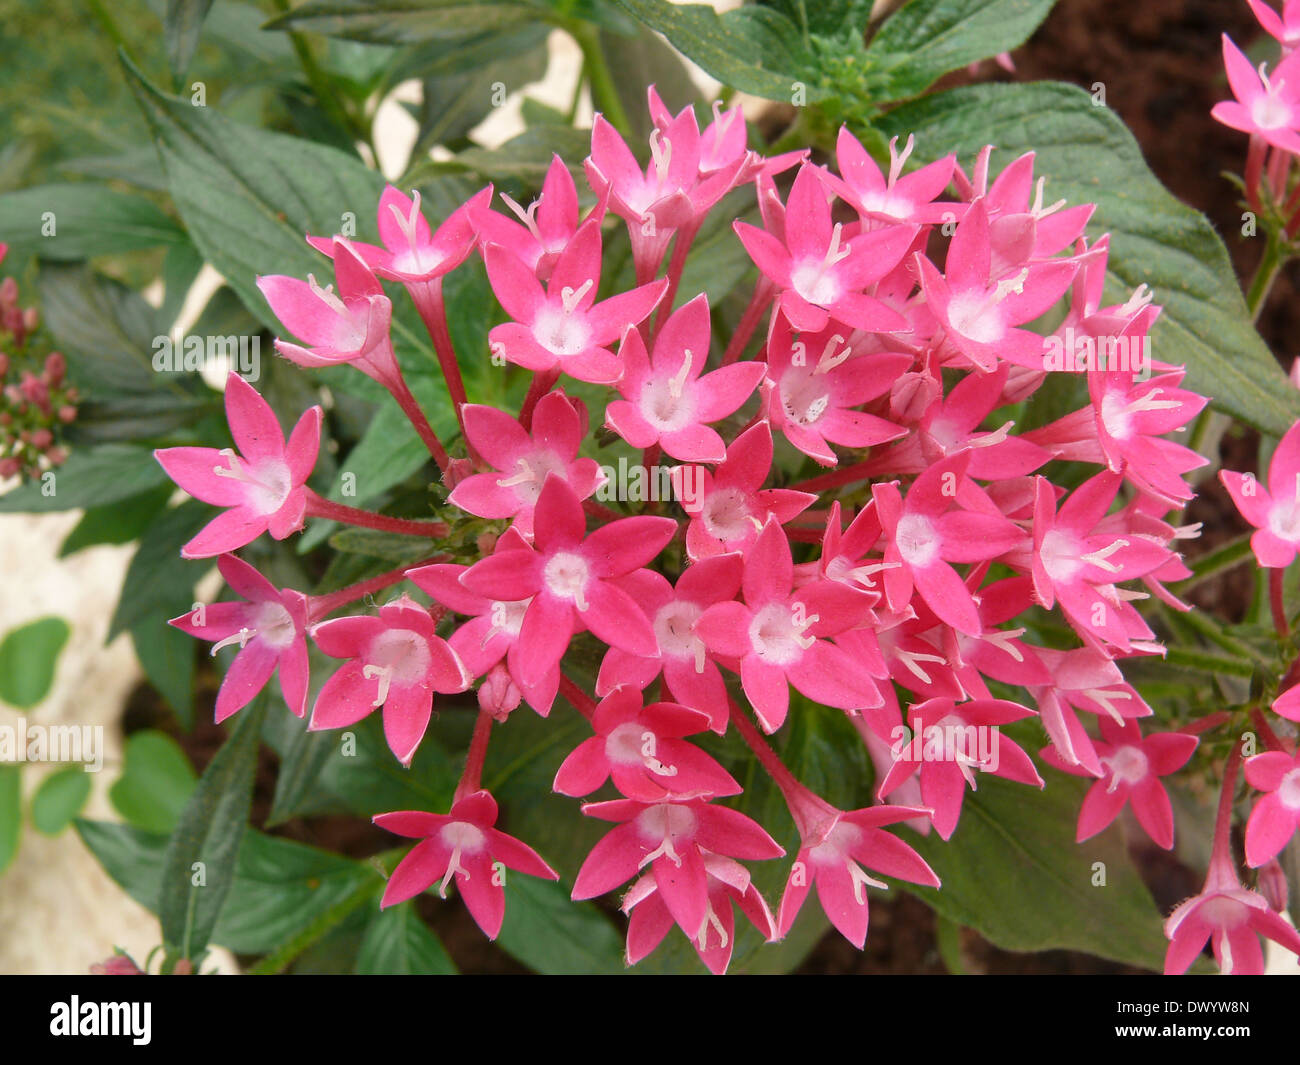 Pentas, Star flower, Star cluster, Pentas lanceolata, Rubiaceae - Stock Image